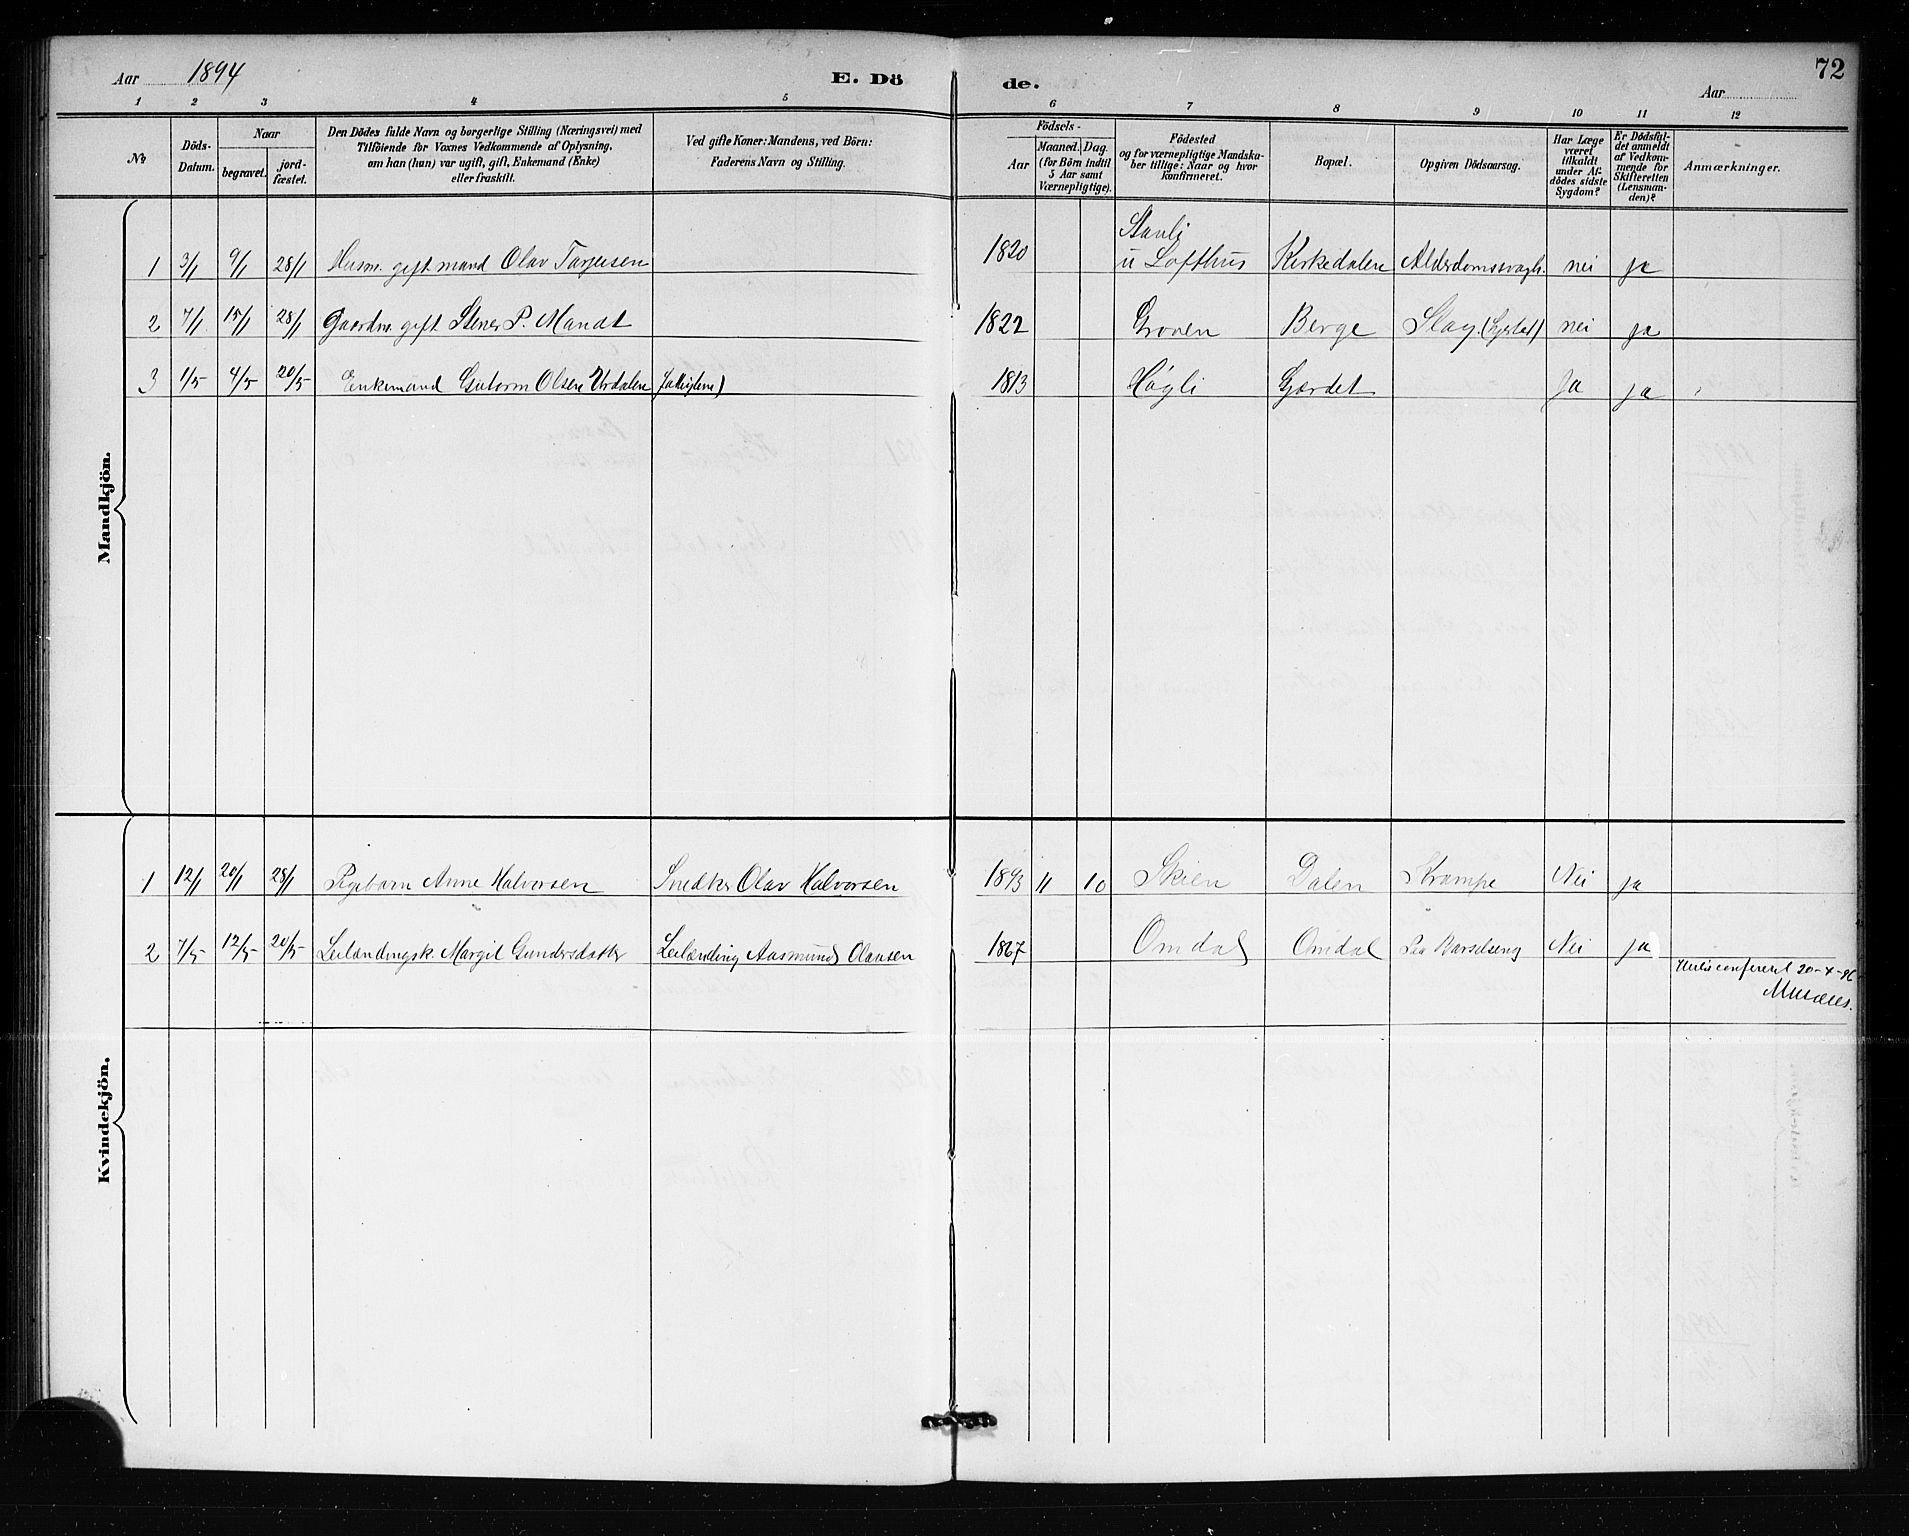 SAKO, Lårdal kirkebøker, G/Gb/L0003: Klokkerbok nr. II 3, 1889-1920, s. 72